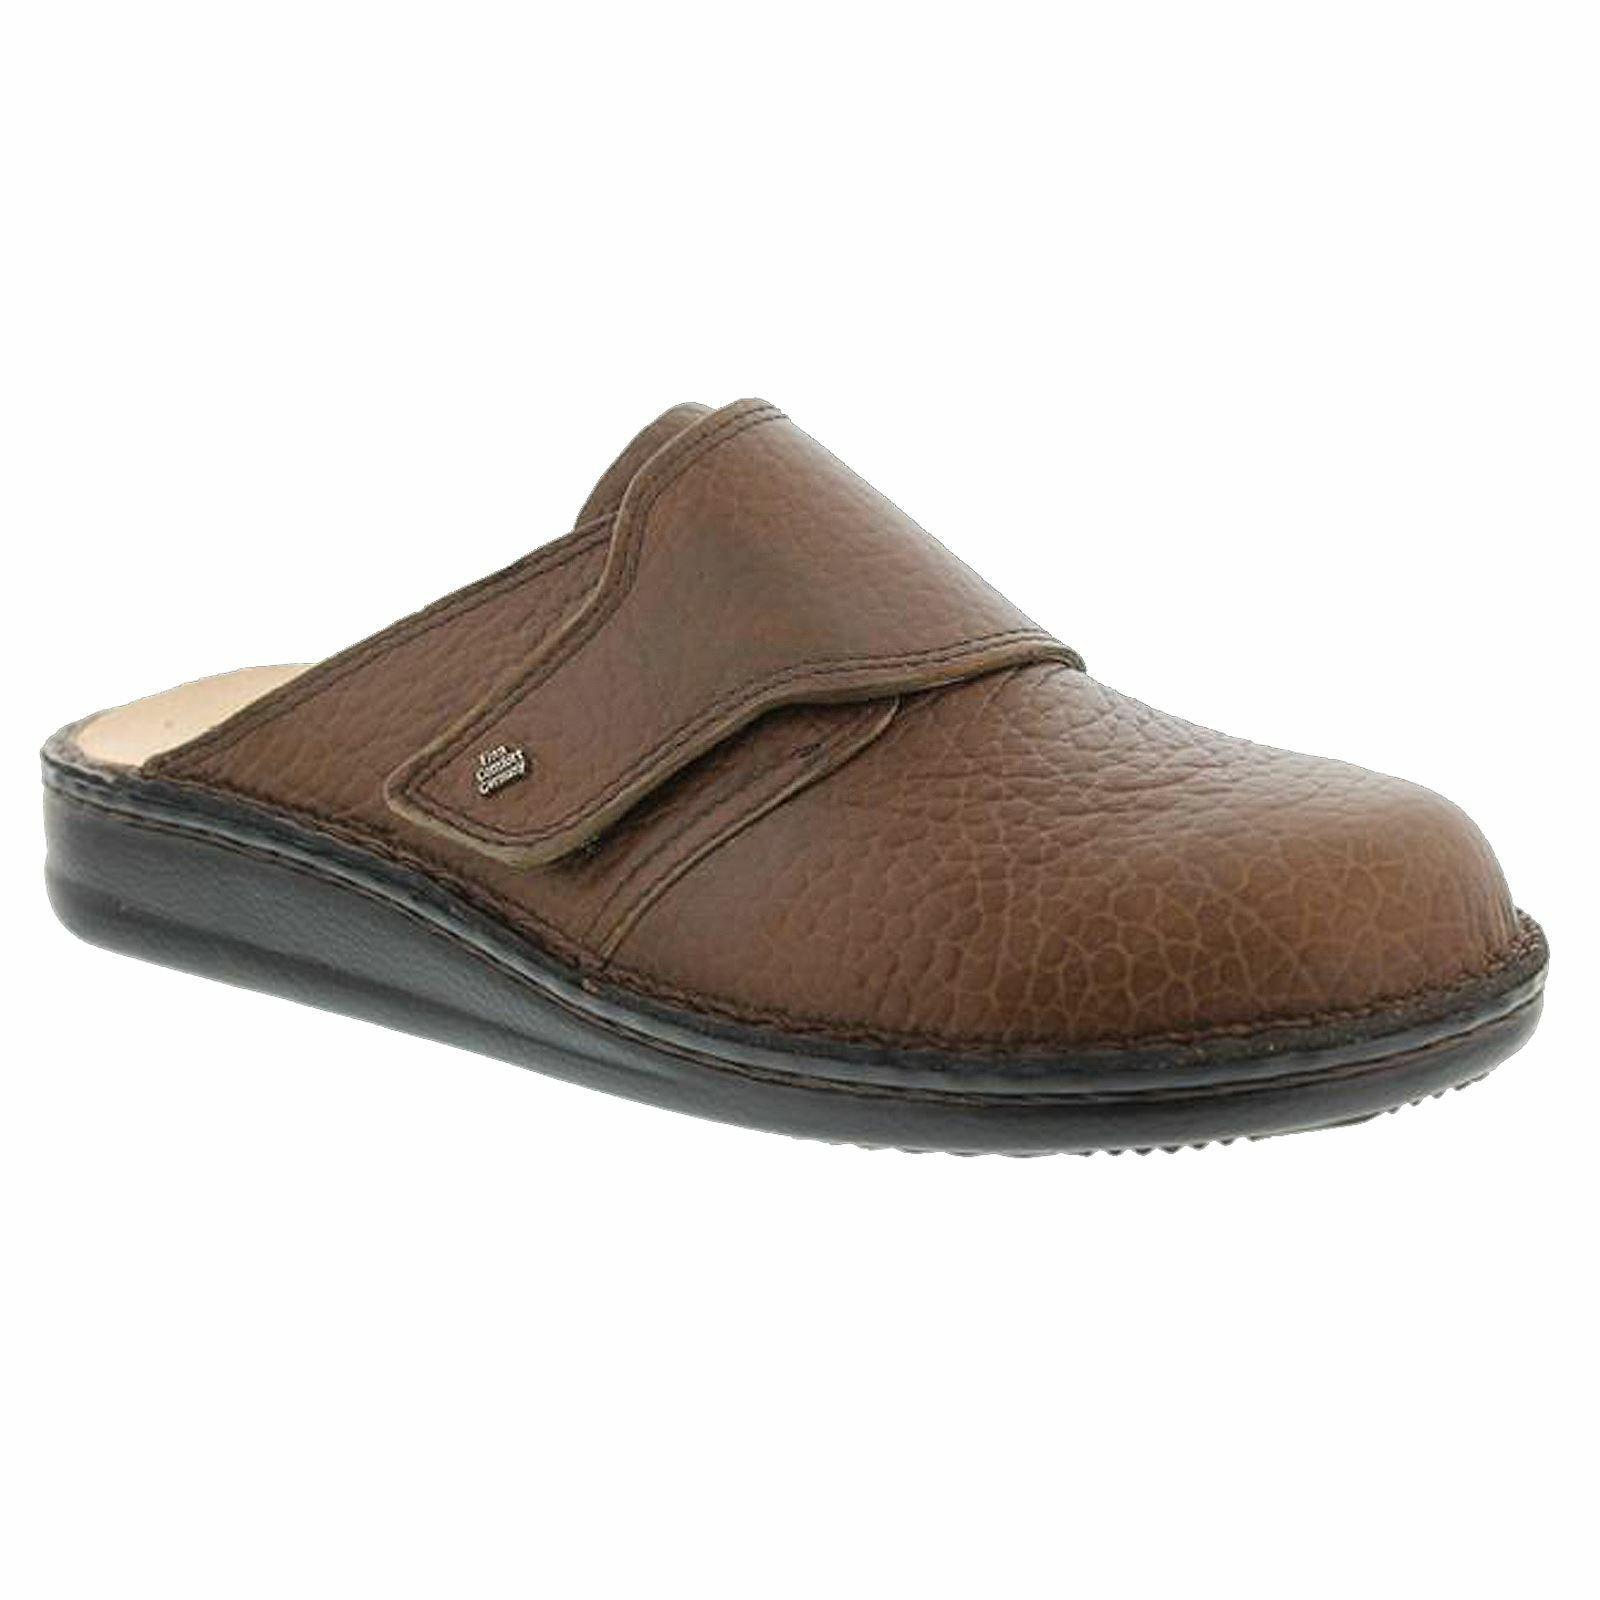 Finn Comfort Mens Amalfi Brown Leather Sandals